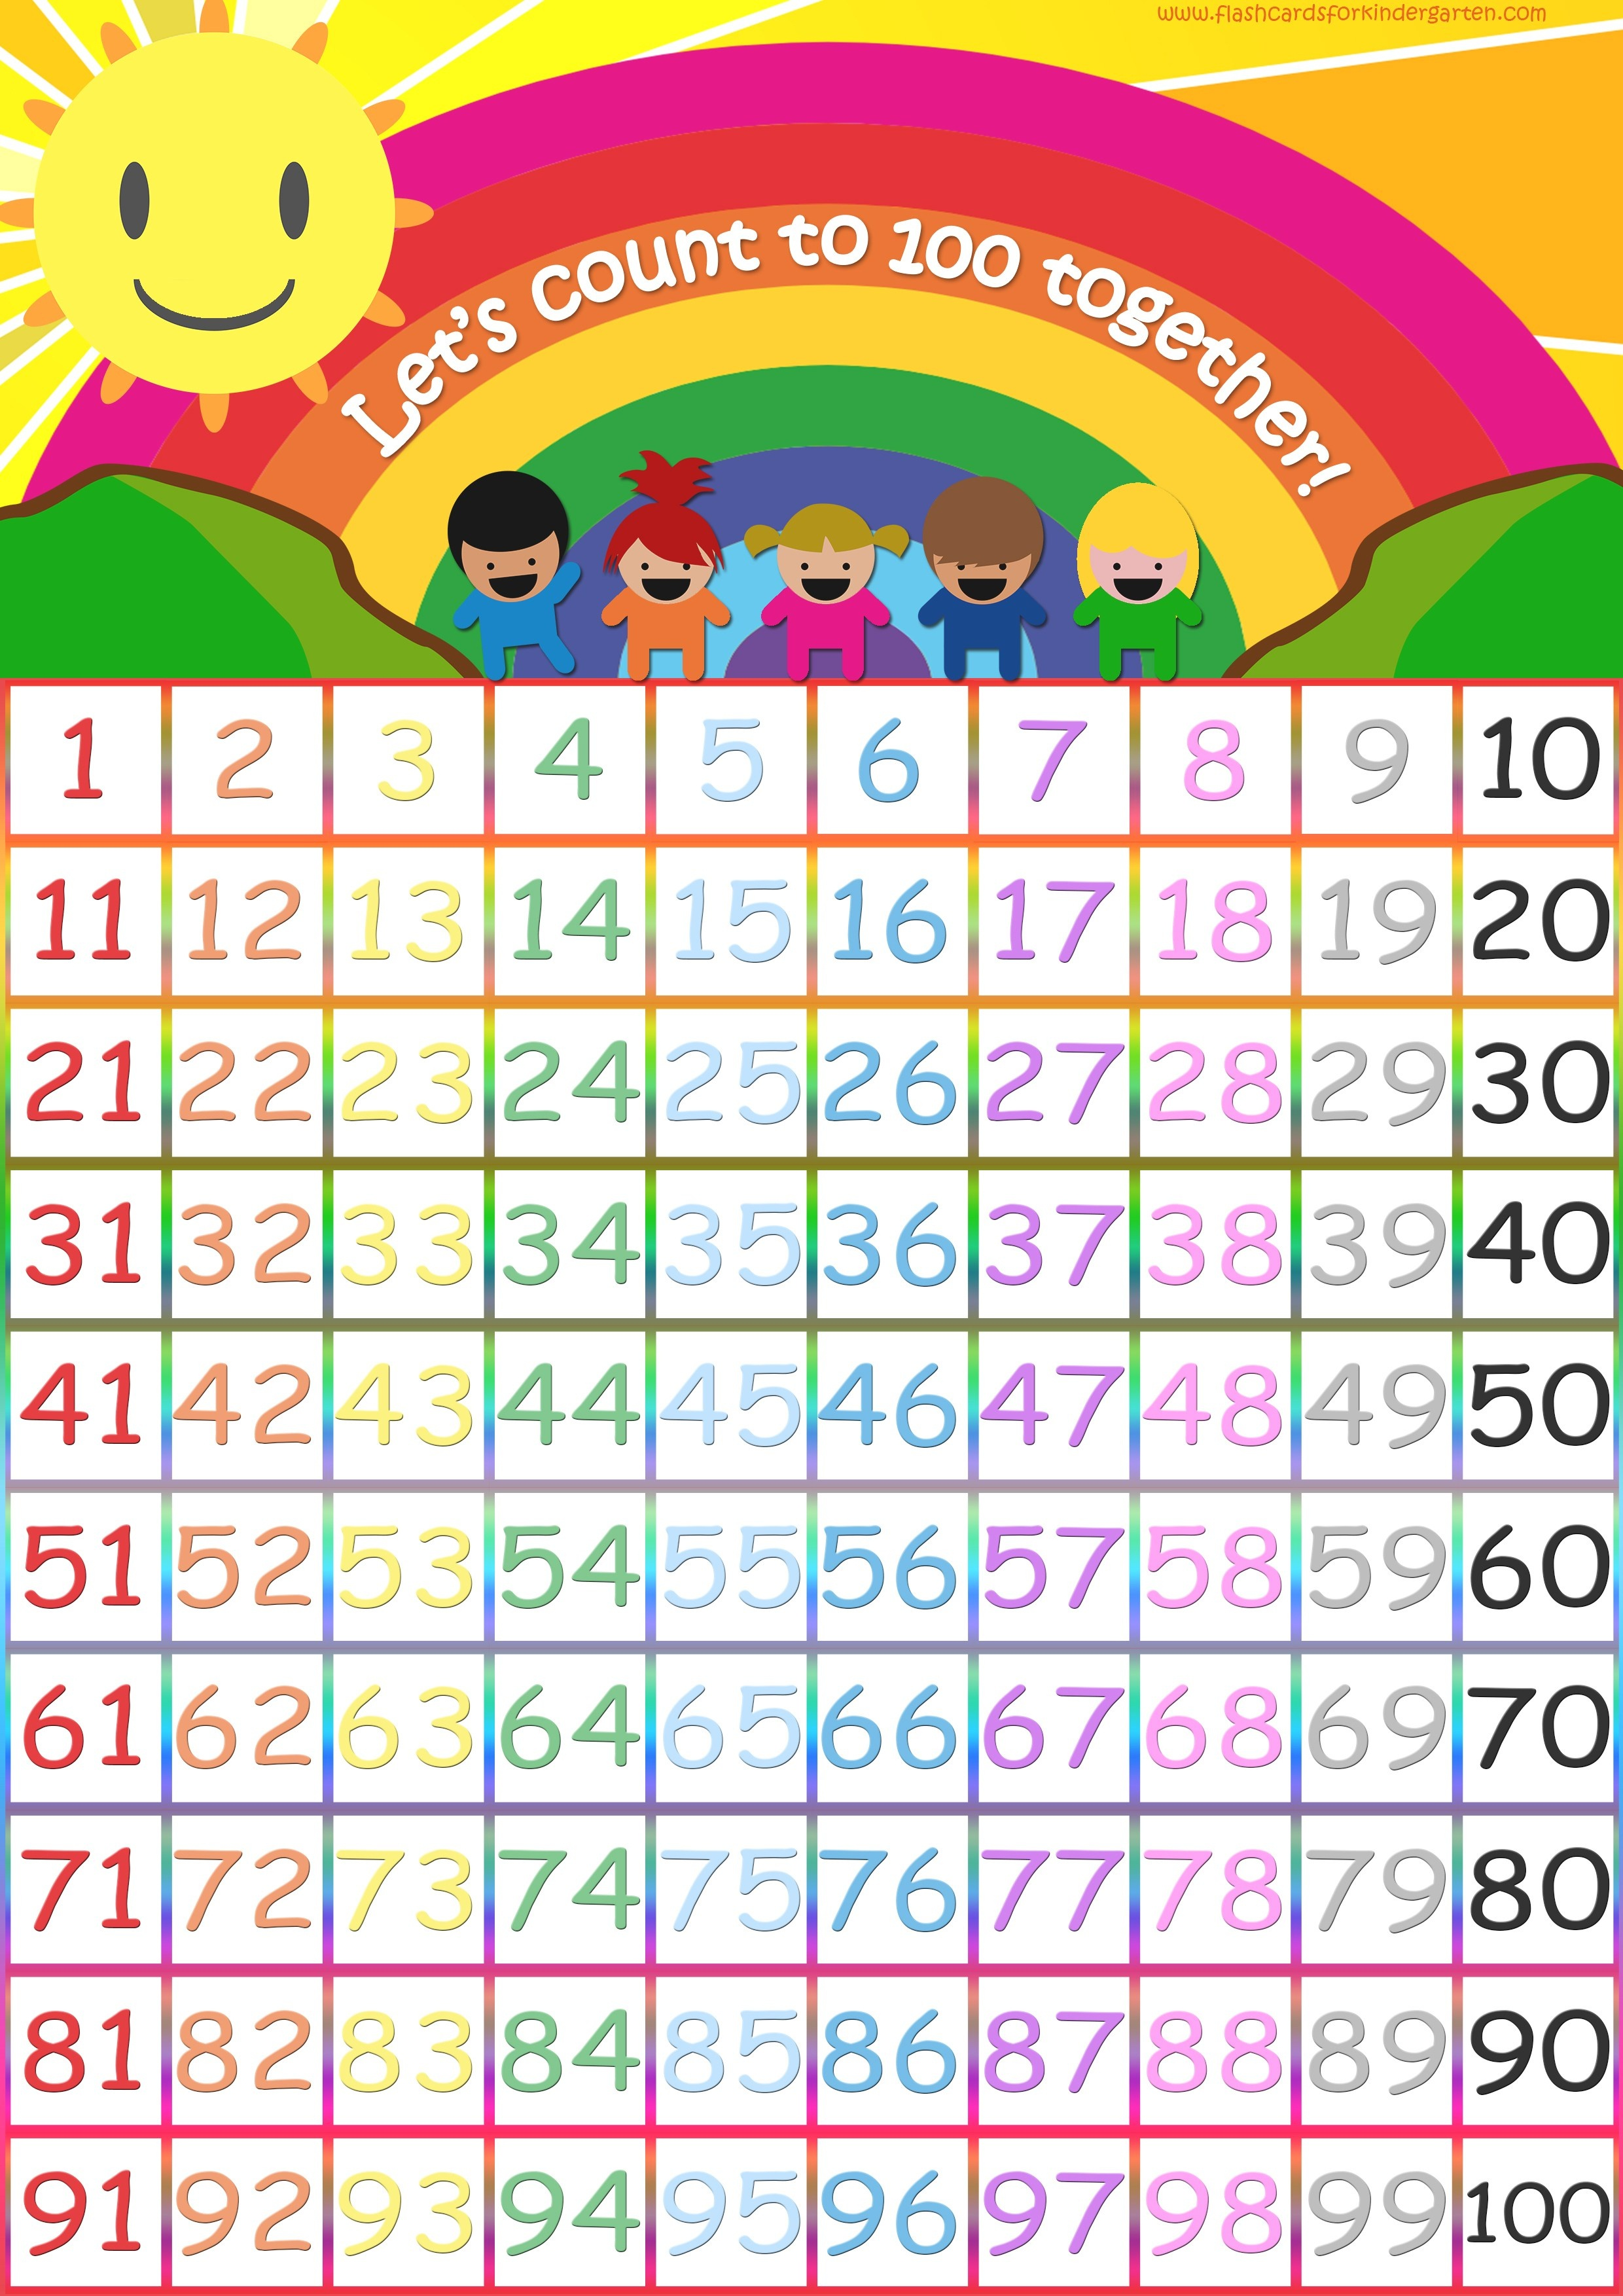 Number Flashcards - Teach Numbers - Free Flashcards & Posters! - Free Printable Number Flashcards 1 30